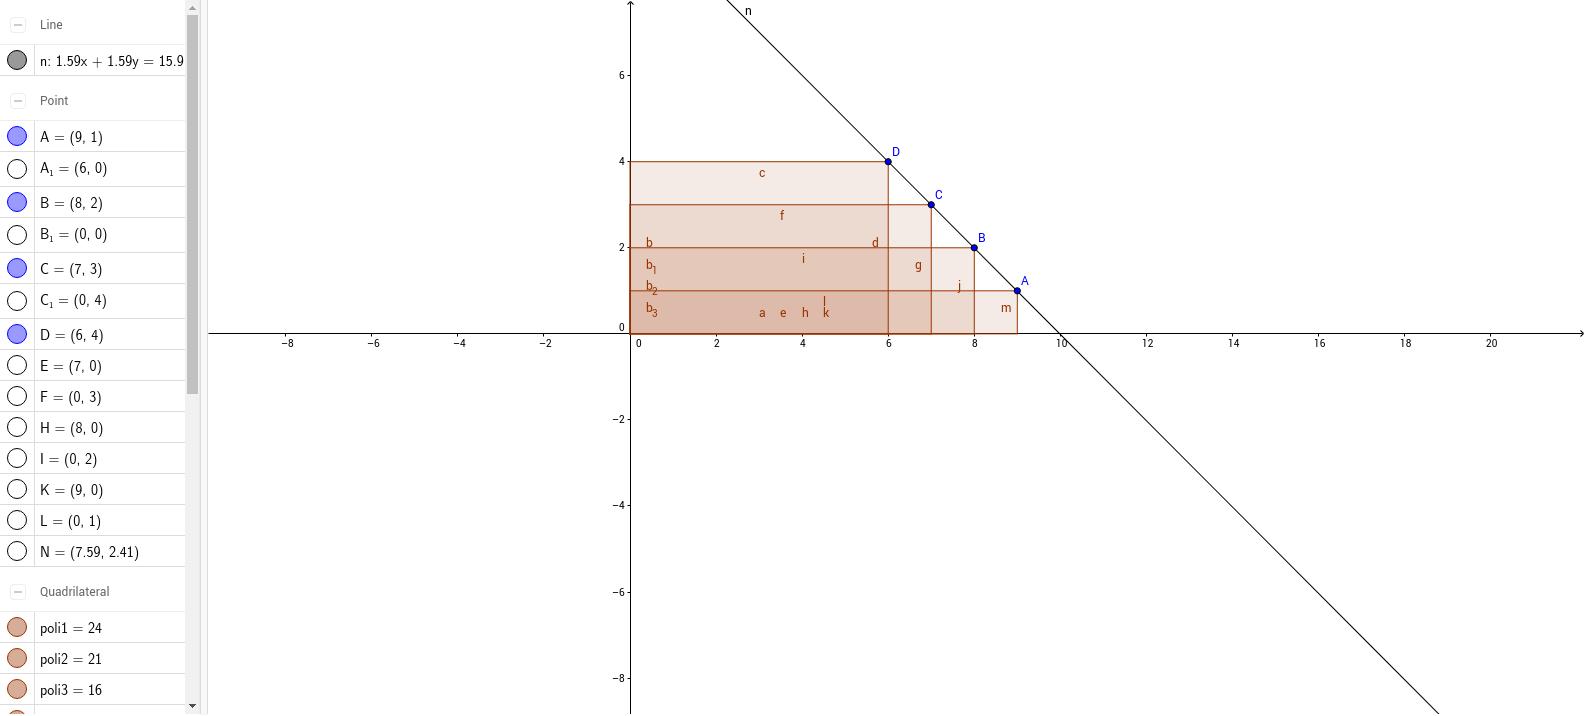 Rettangoli isoperimetrici2 gruppo 6